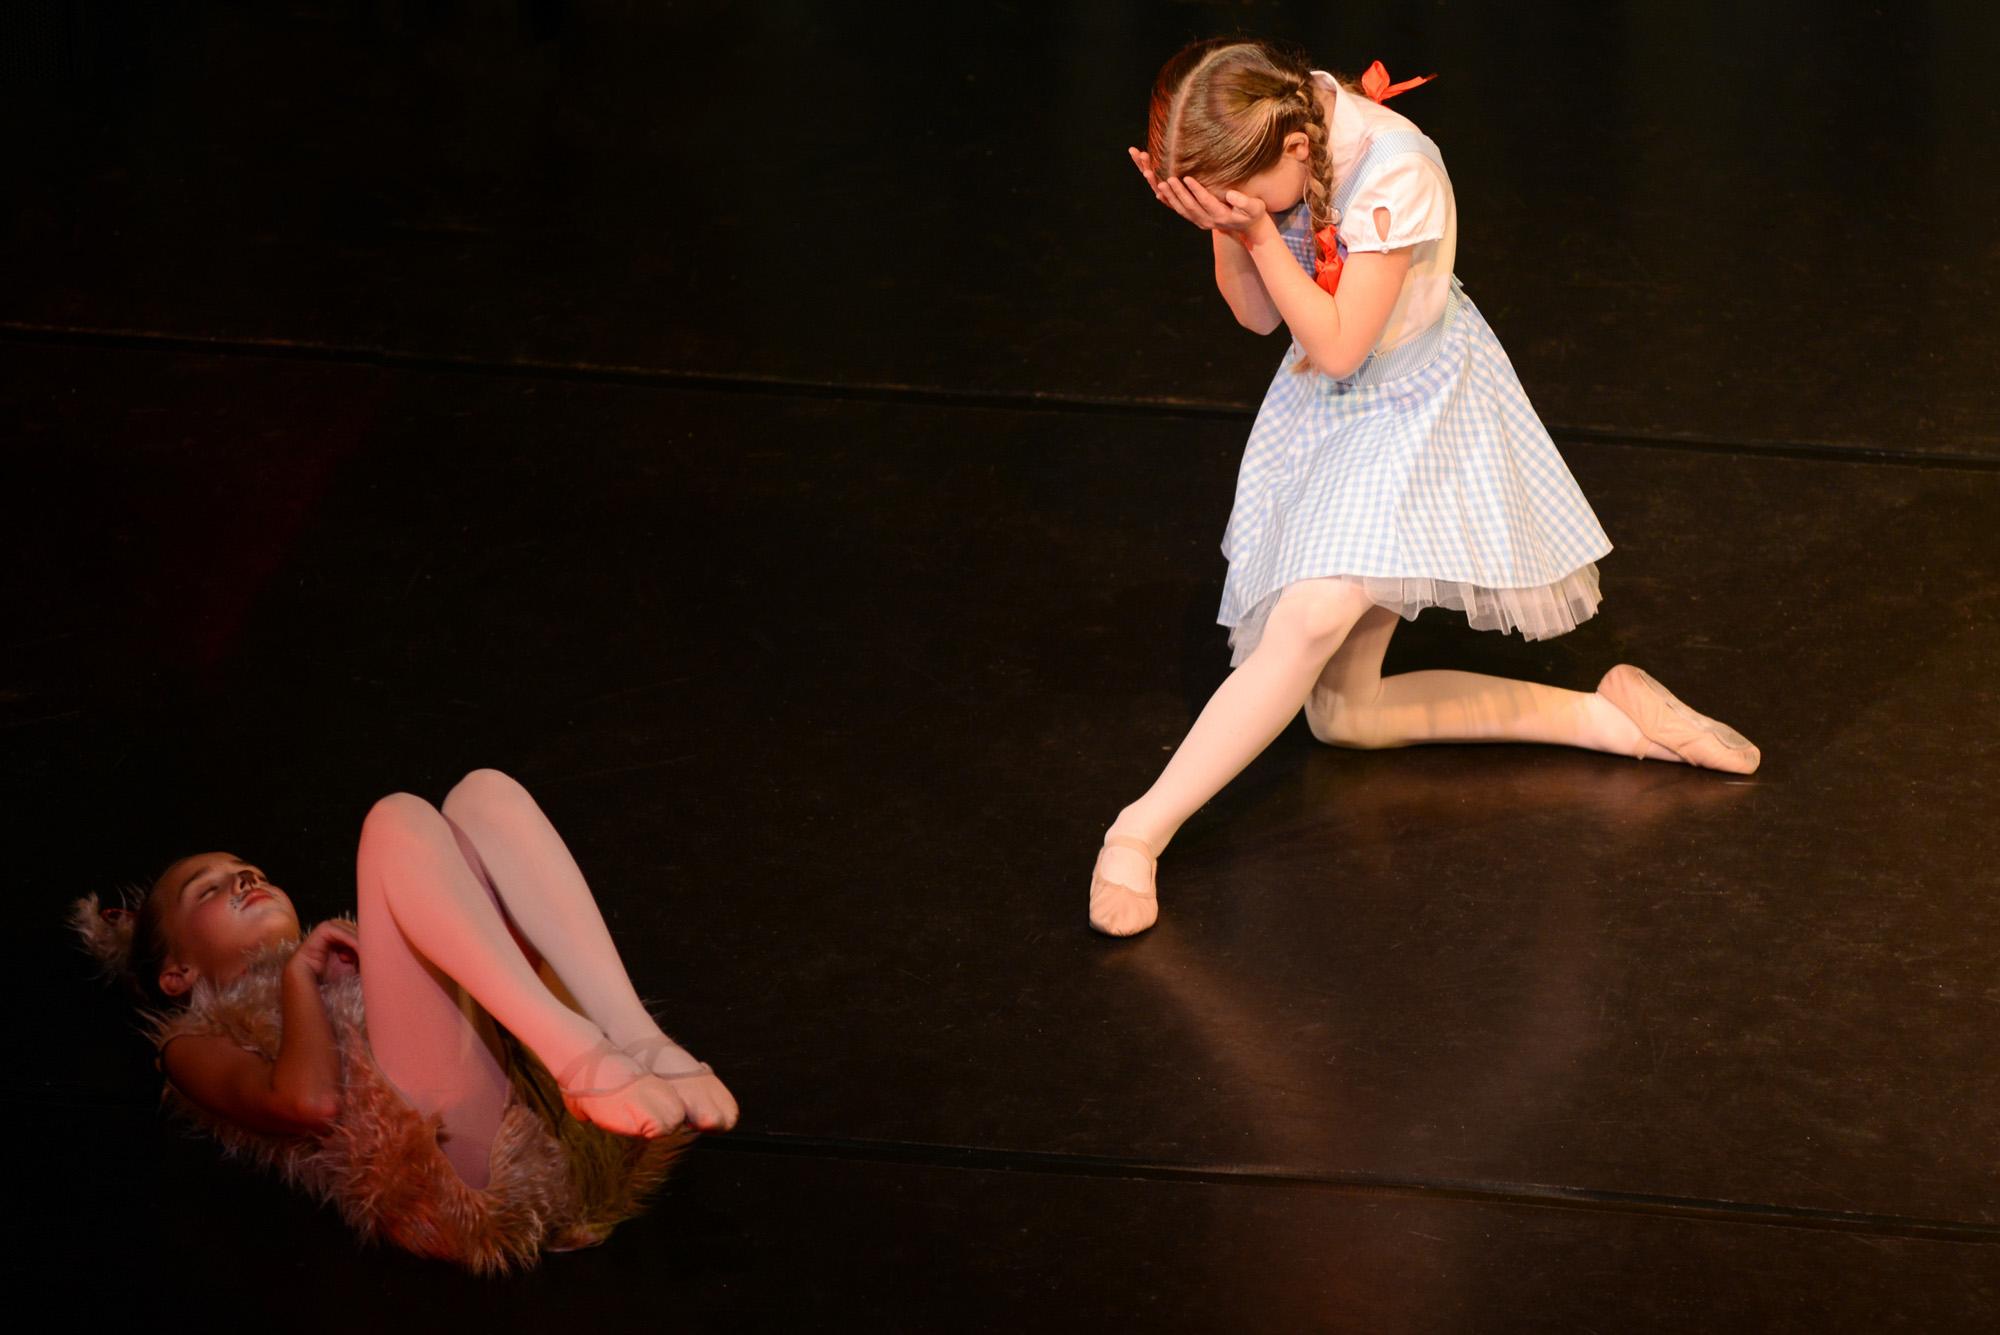 2014_Wizard_of_Oz Ballet School London 16.jpg